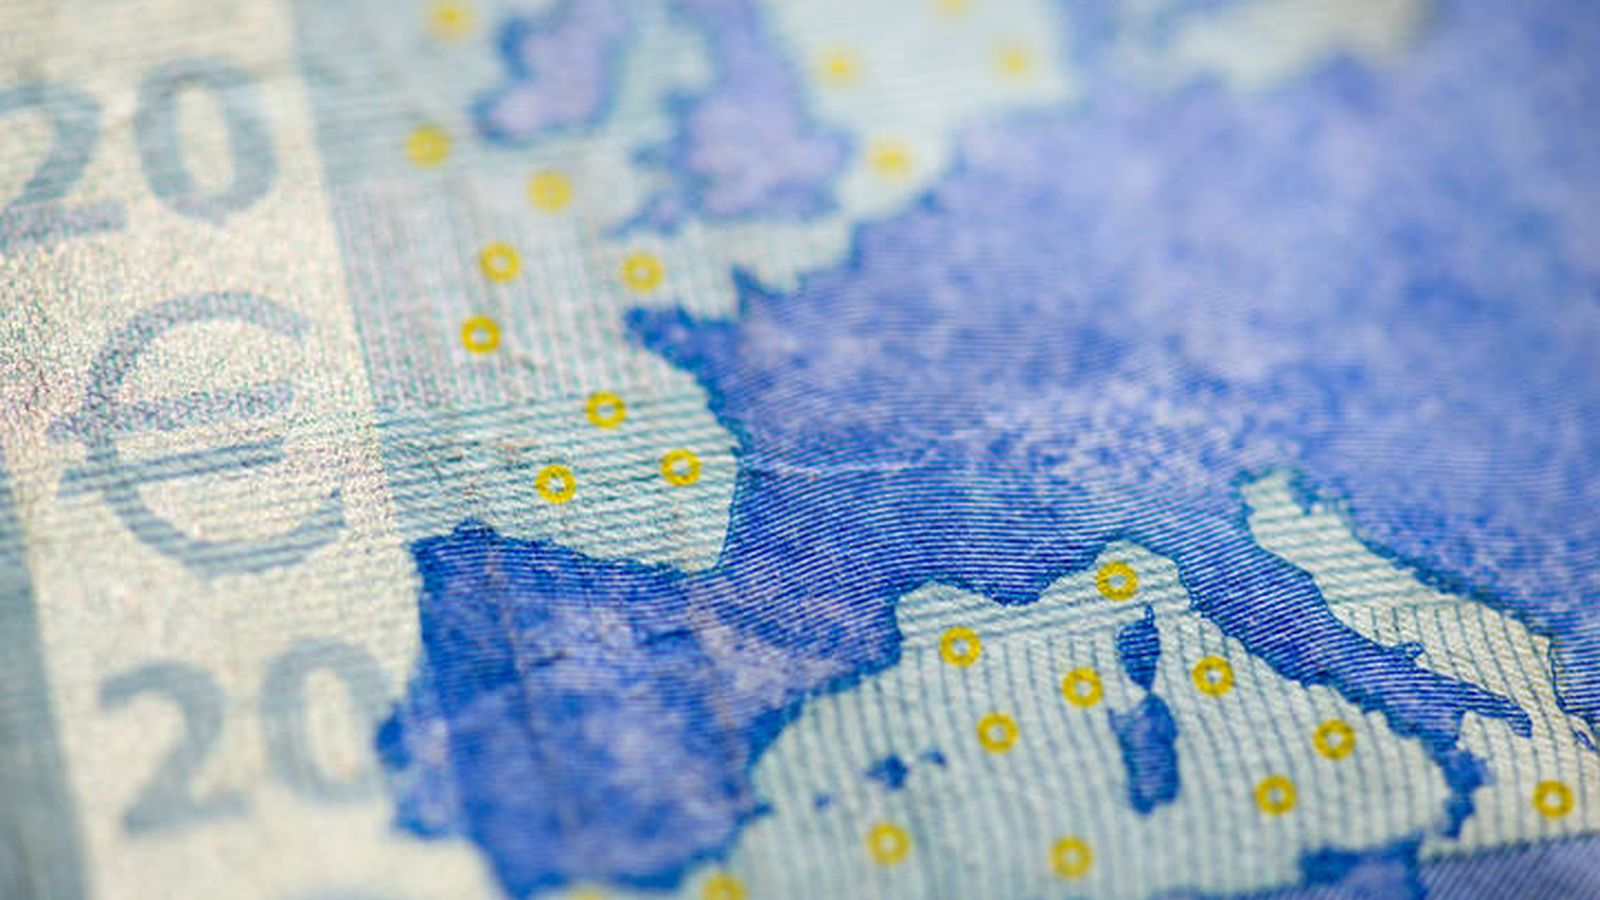 Foto: Imagen de un billete de 20 euros. (Istock)